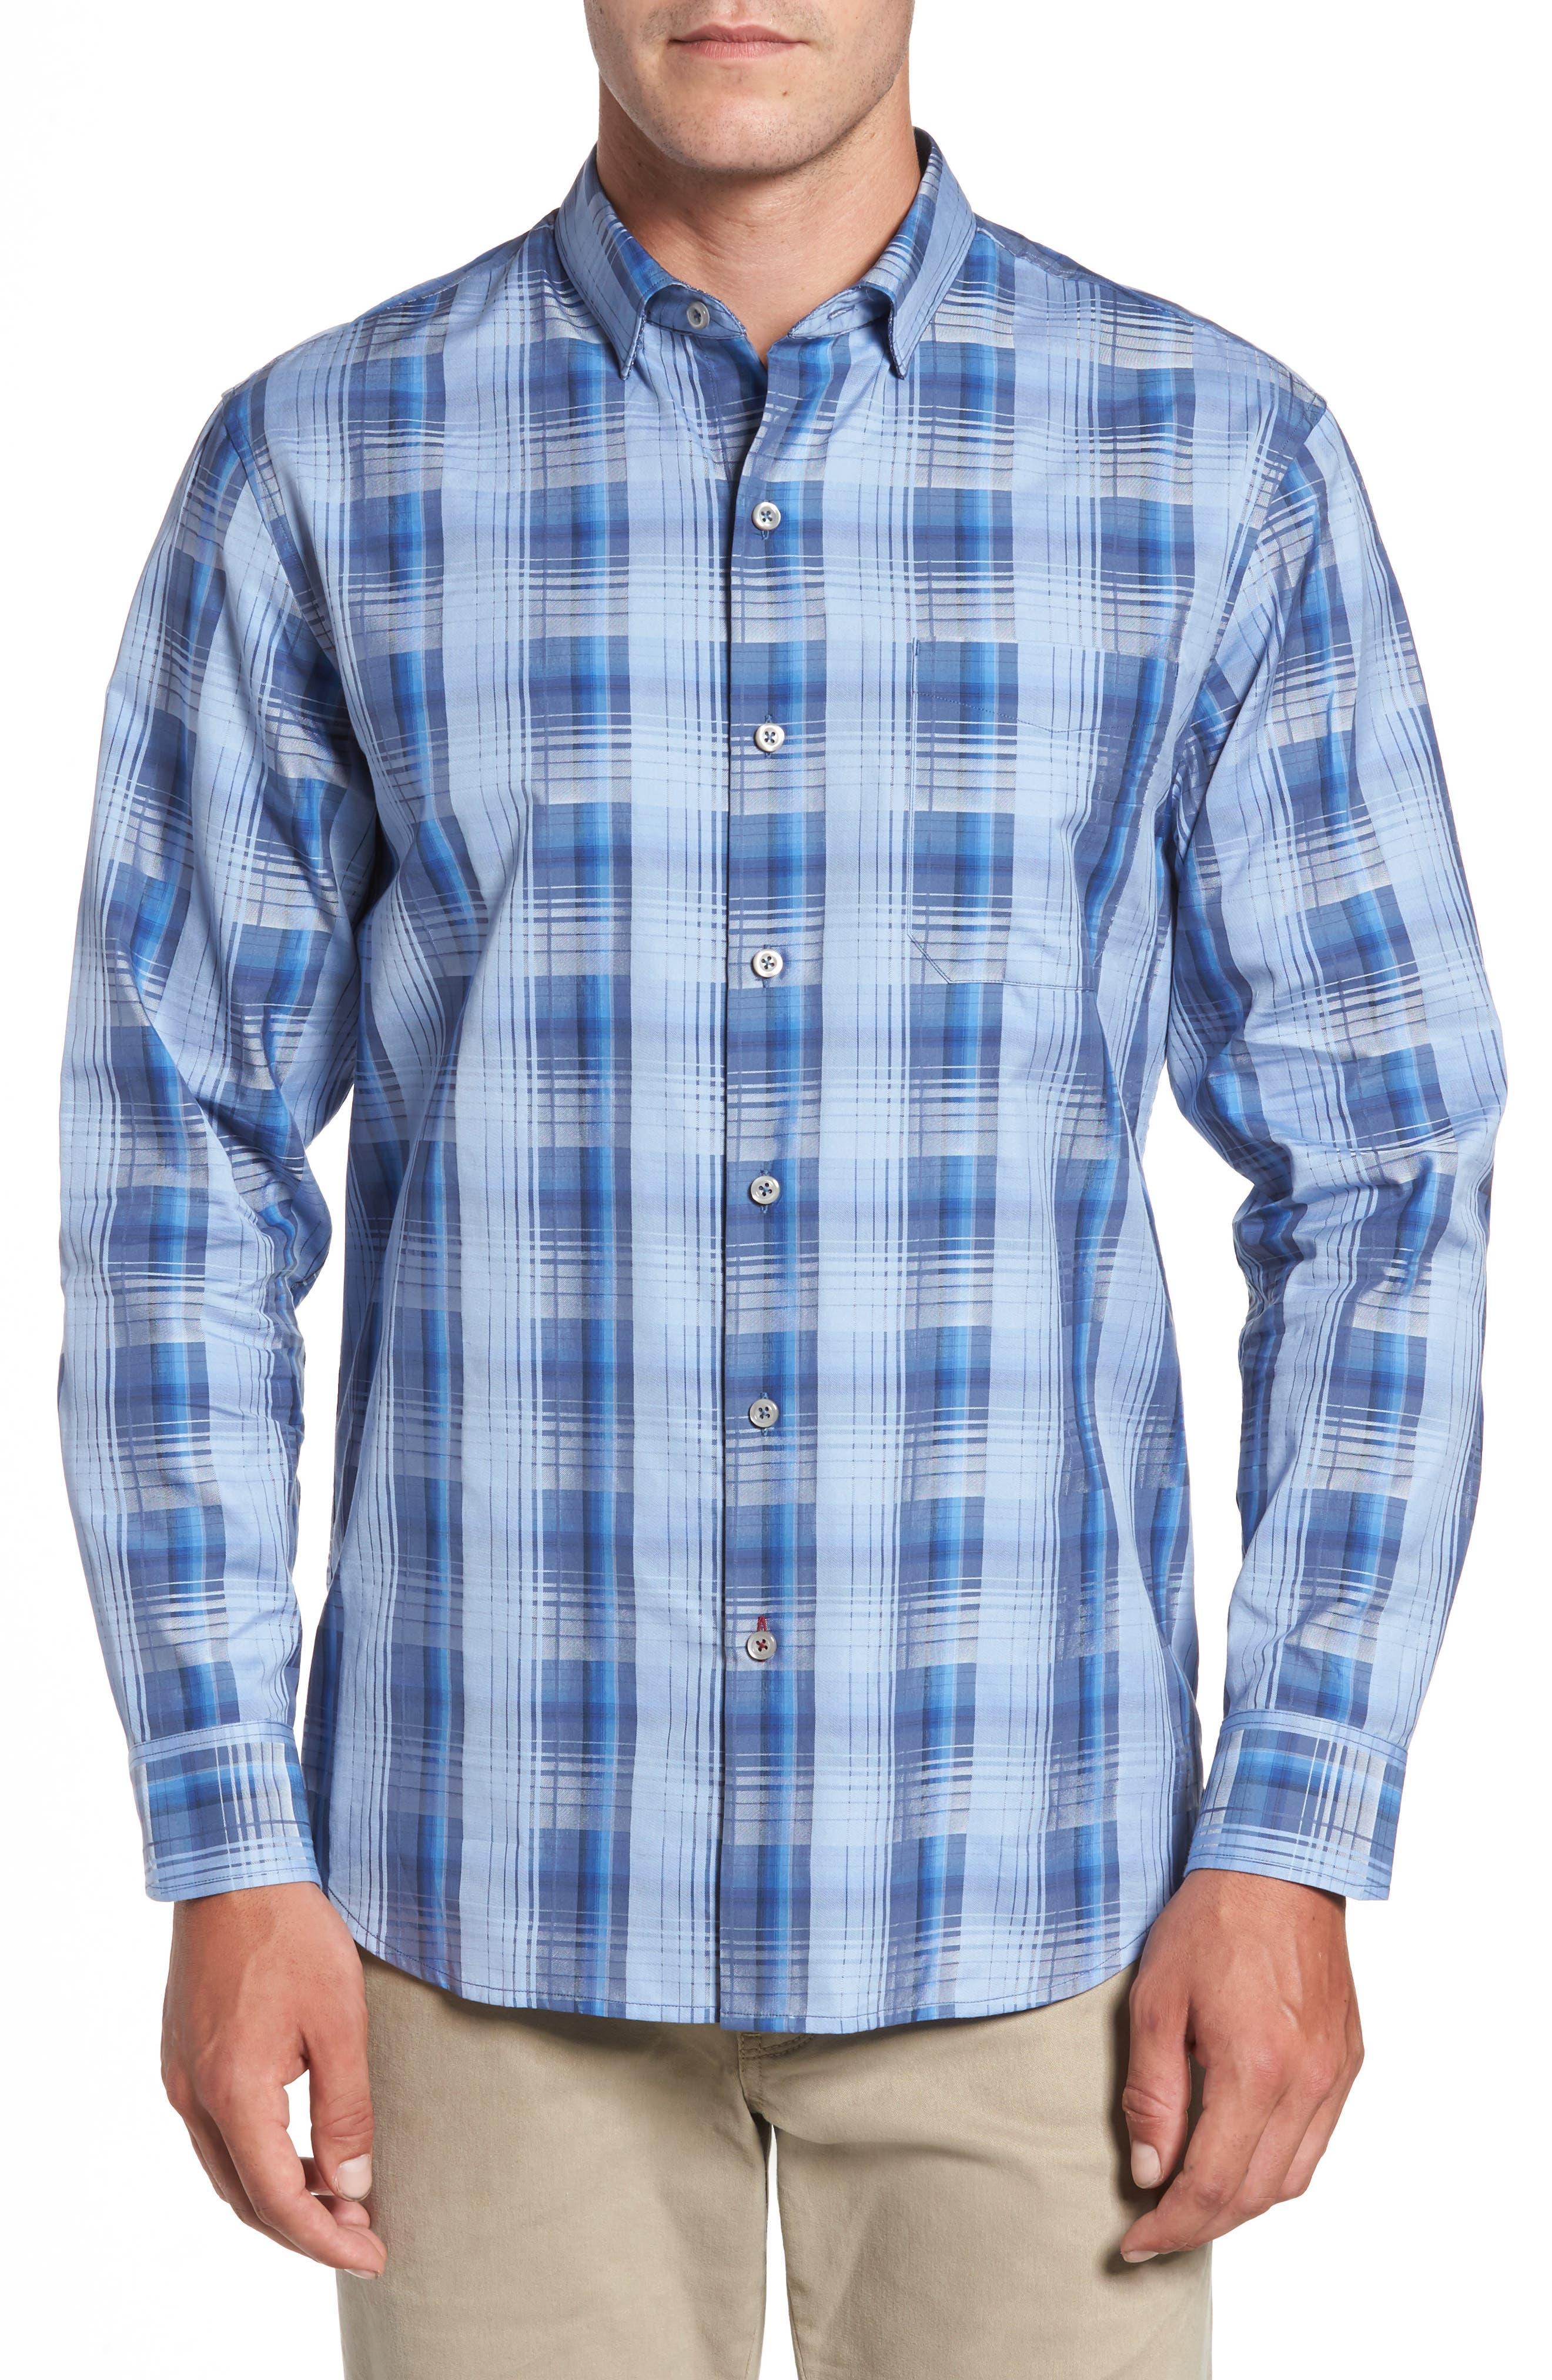 Main Image - Tommy Bahama Shadow Ridge Check Cotton & Silk Sport Shirt (Big & Tall)